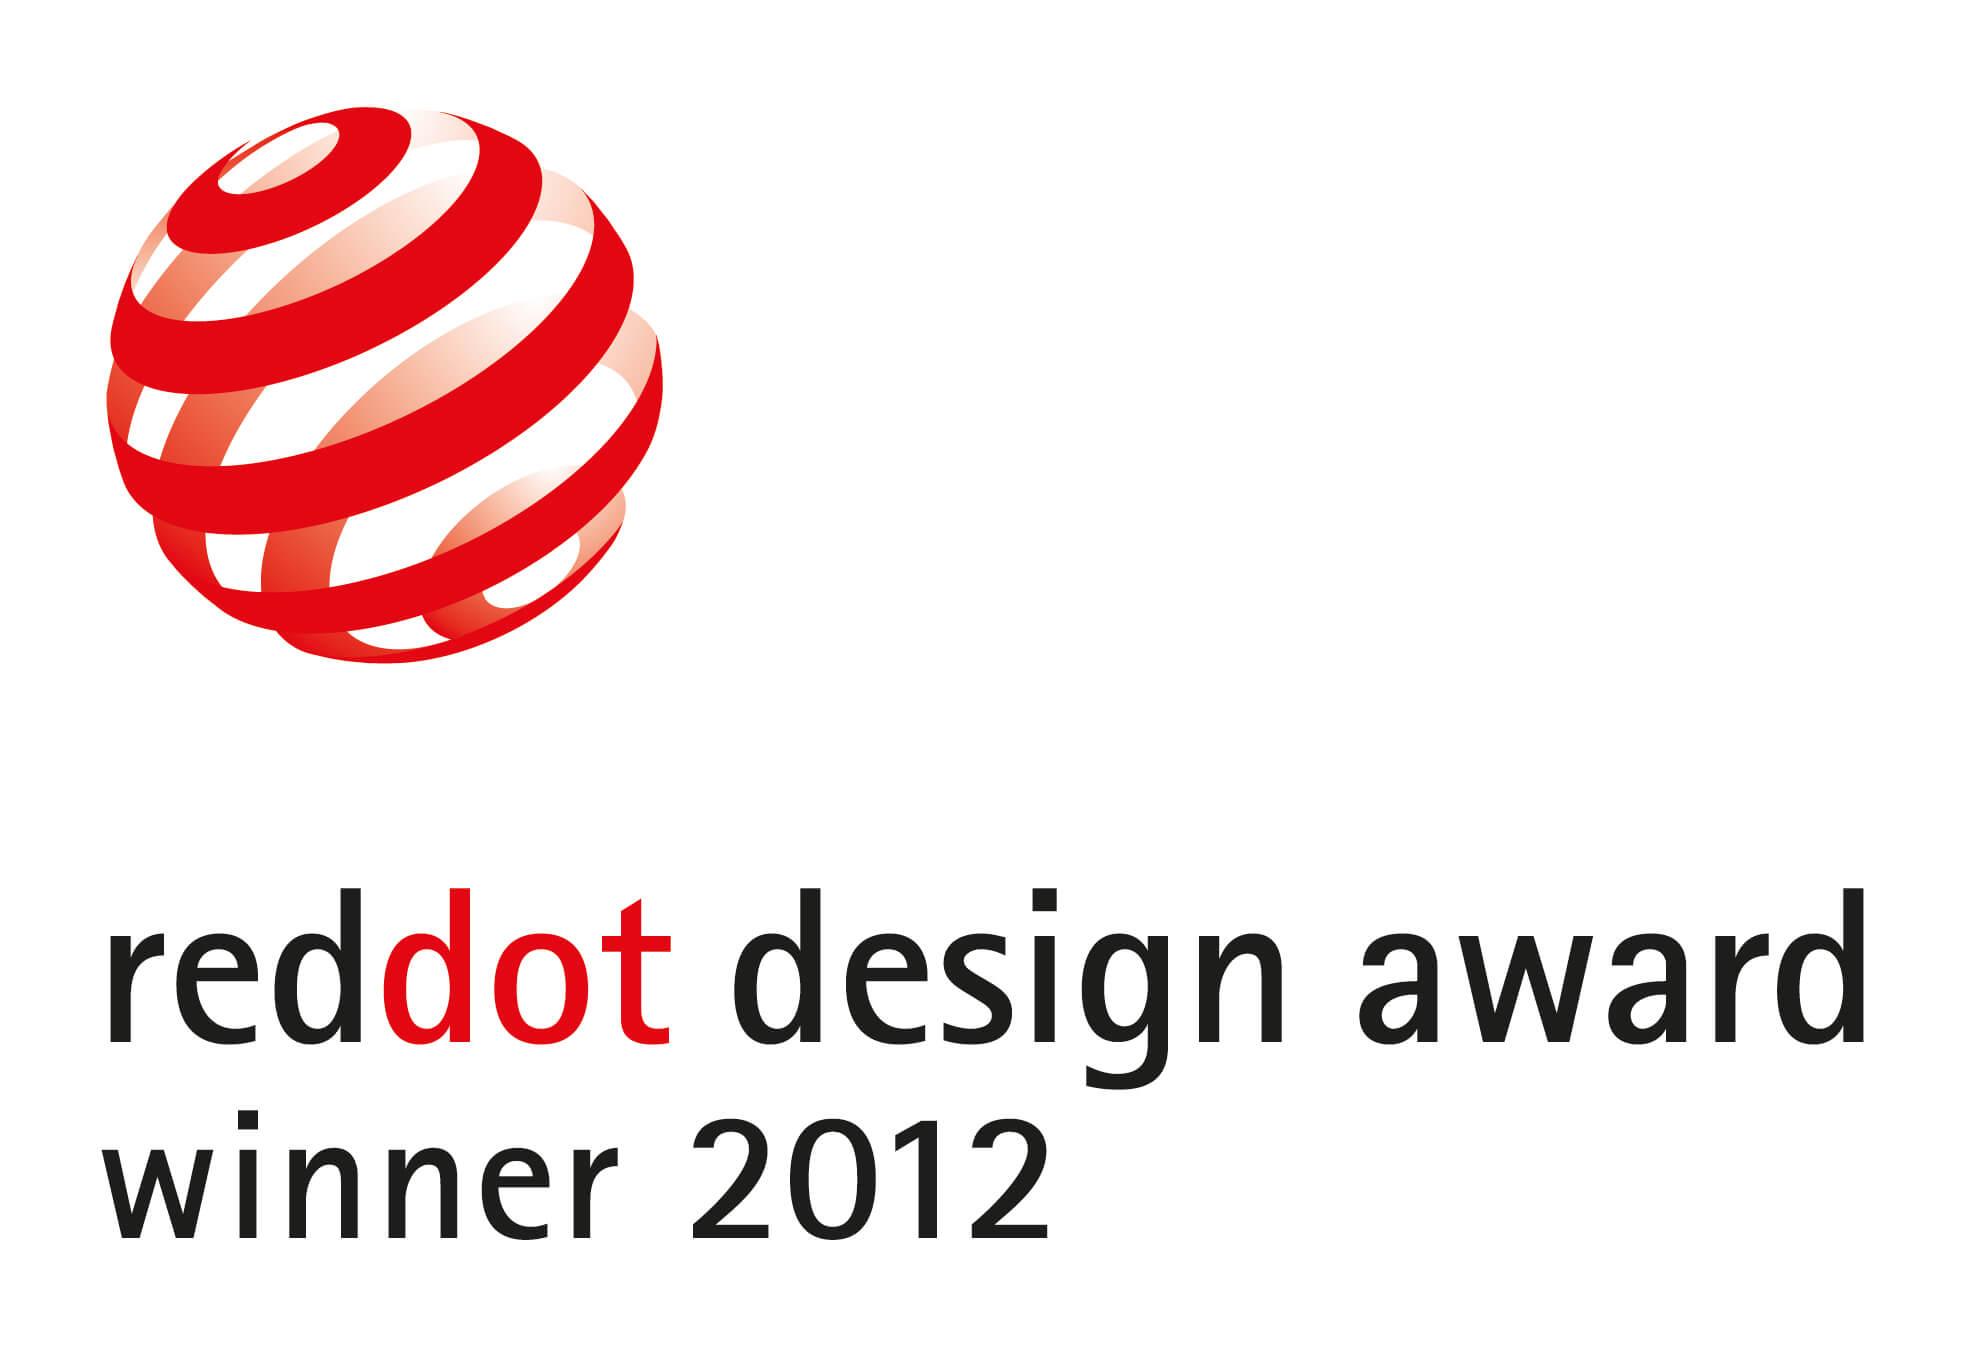 rdda win12 cmyk - Red-Dot-Design-Award für LG PA70G